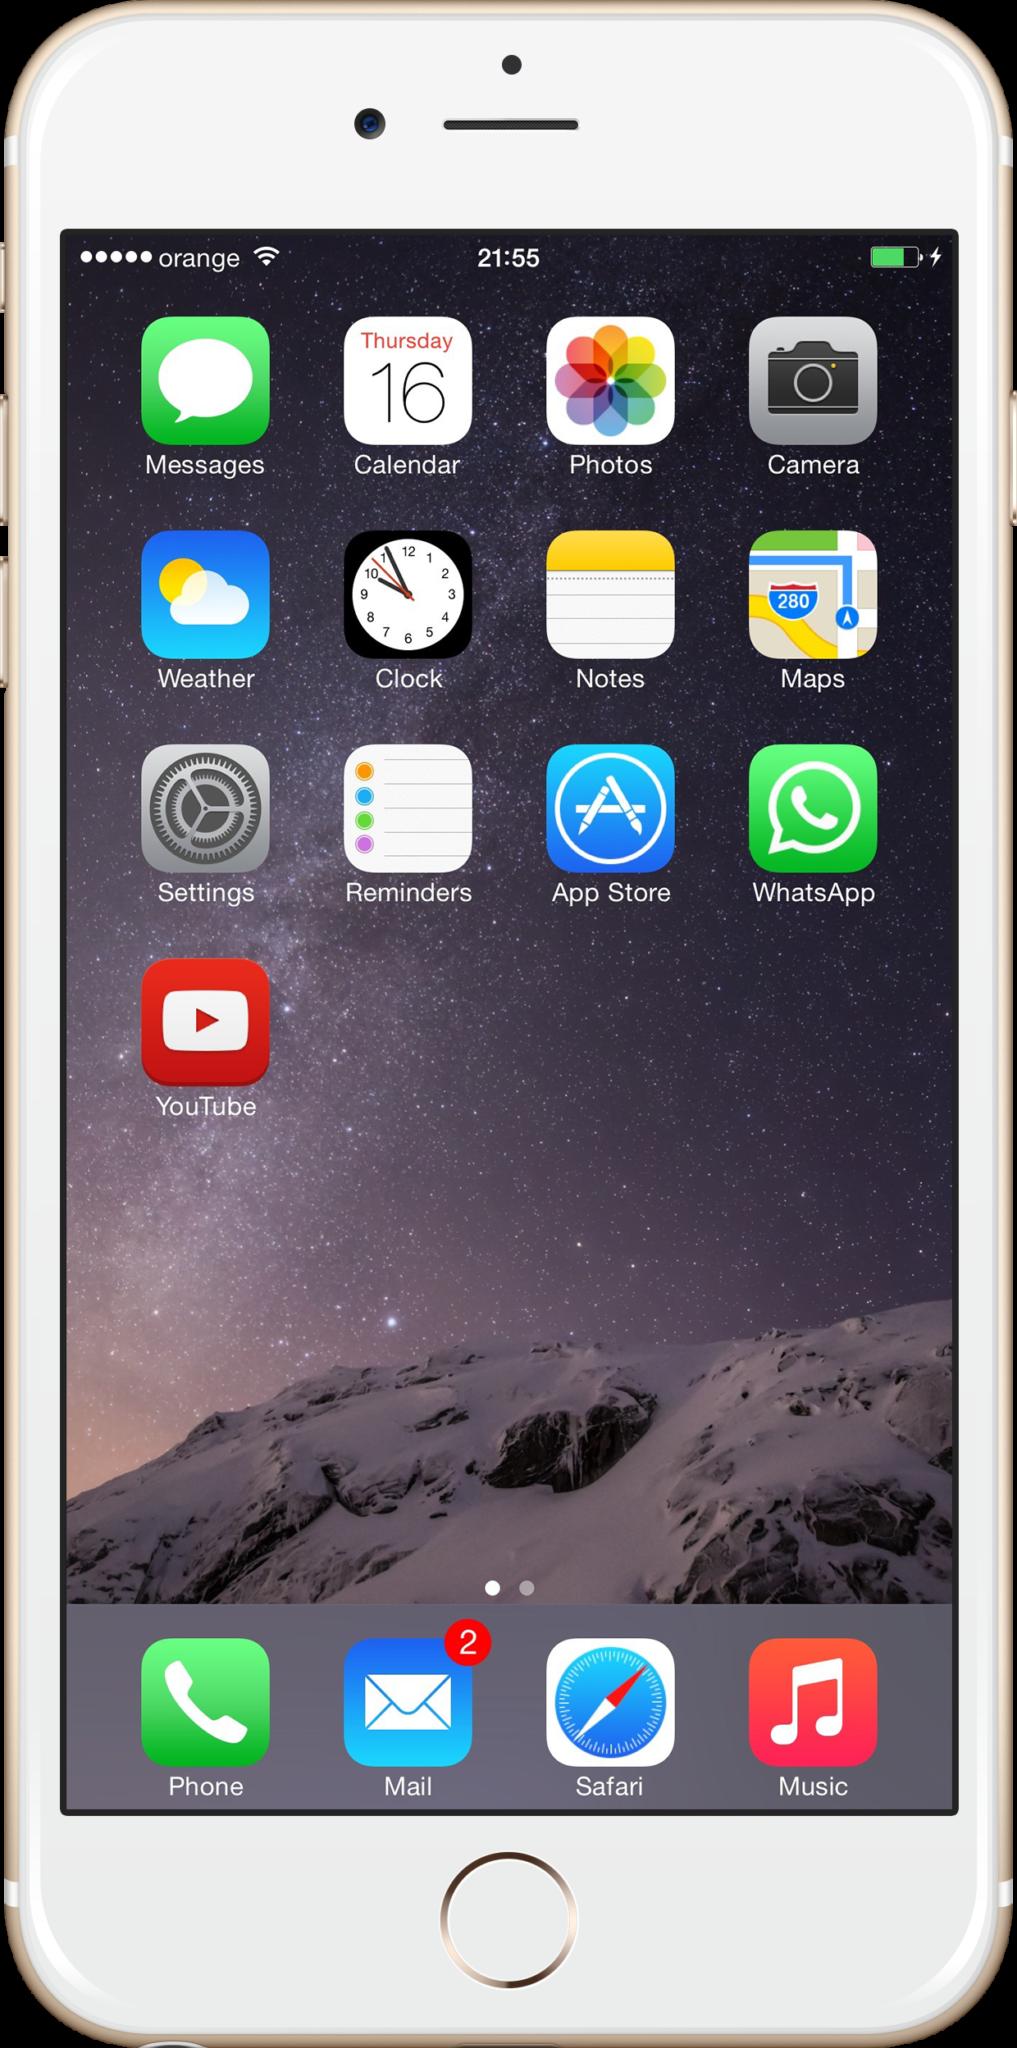 Ремонт iPhone 3G - фото 17 | Сервисный центр Total Apple